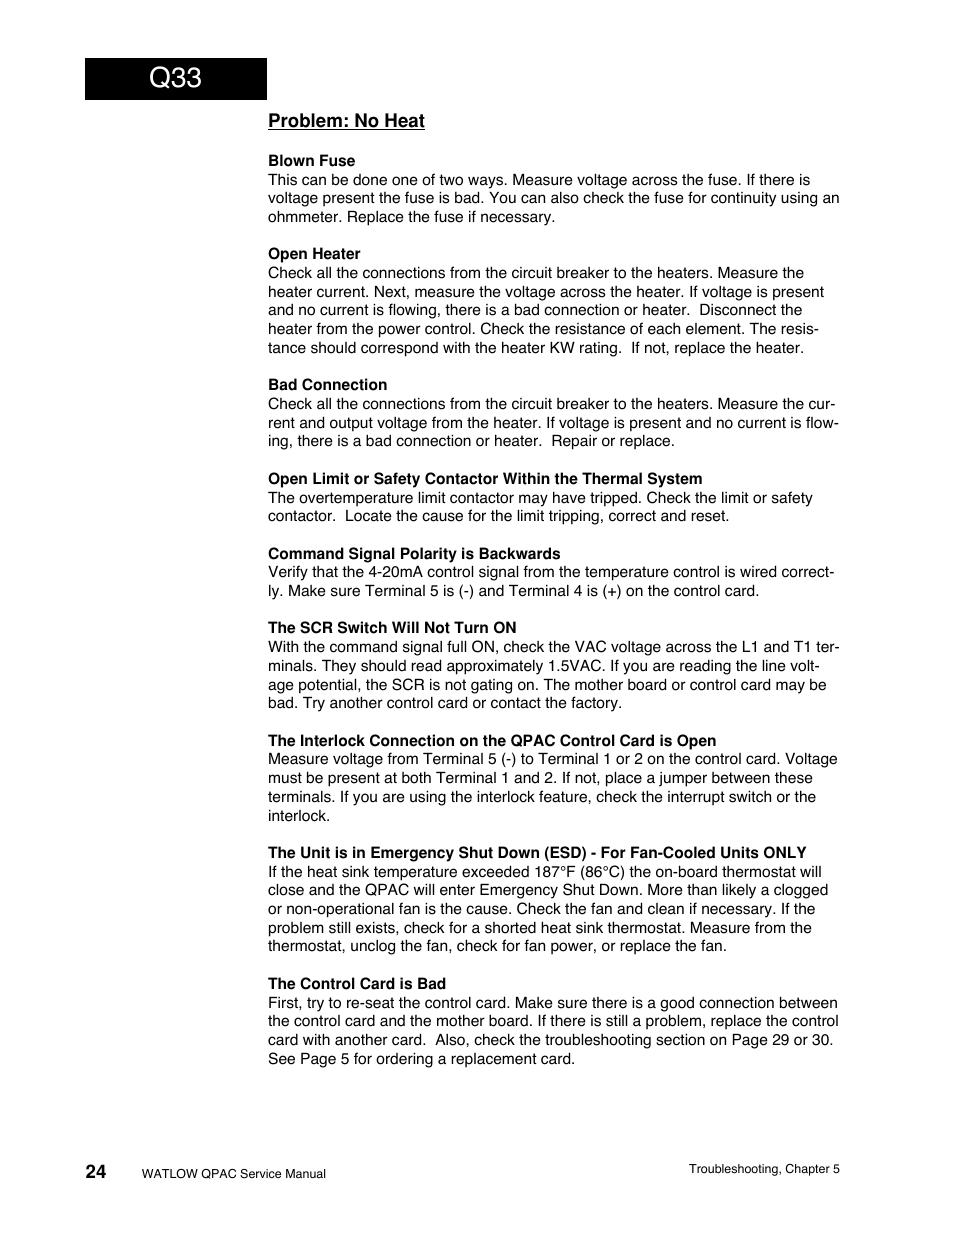 Problem No Heat Q33 Troubleshooting Watlow Qpac Modular Scr Bad Circuit Breaker Power Control Service User Manual Page 24 43